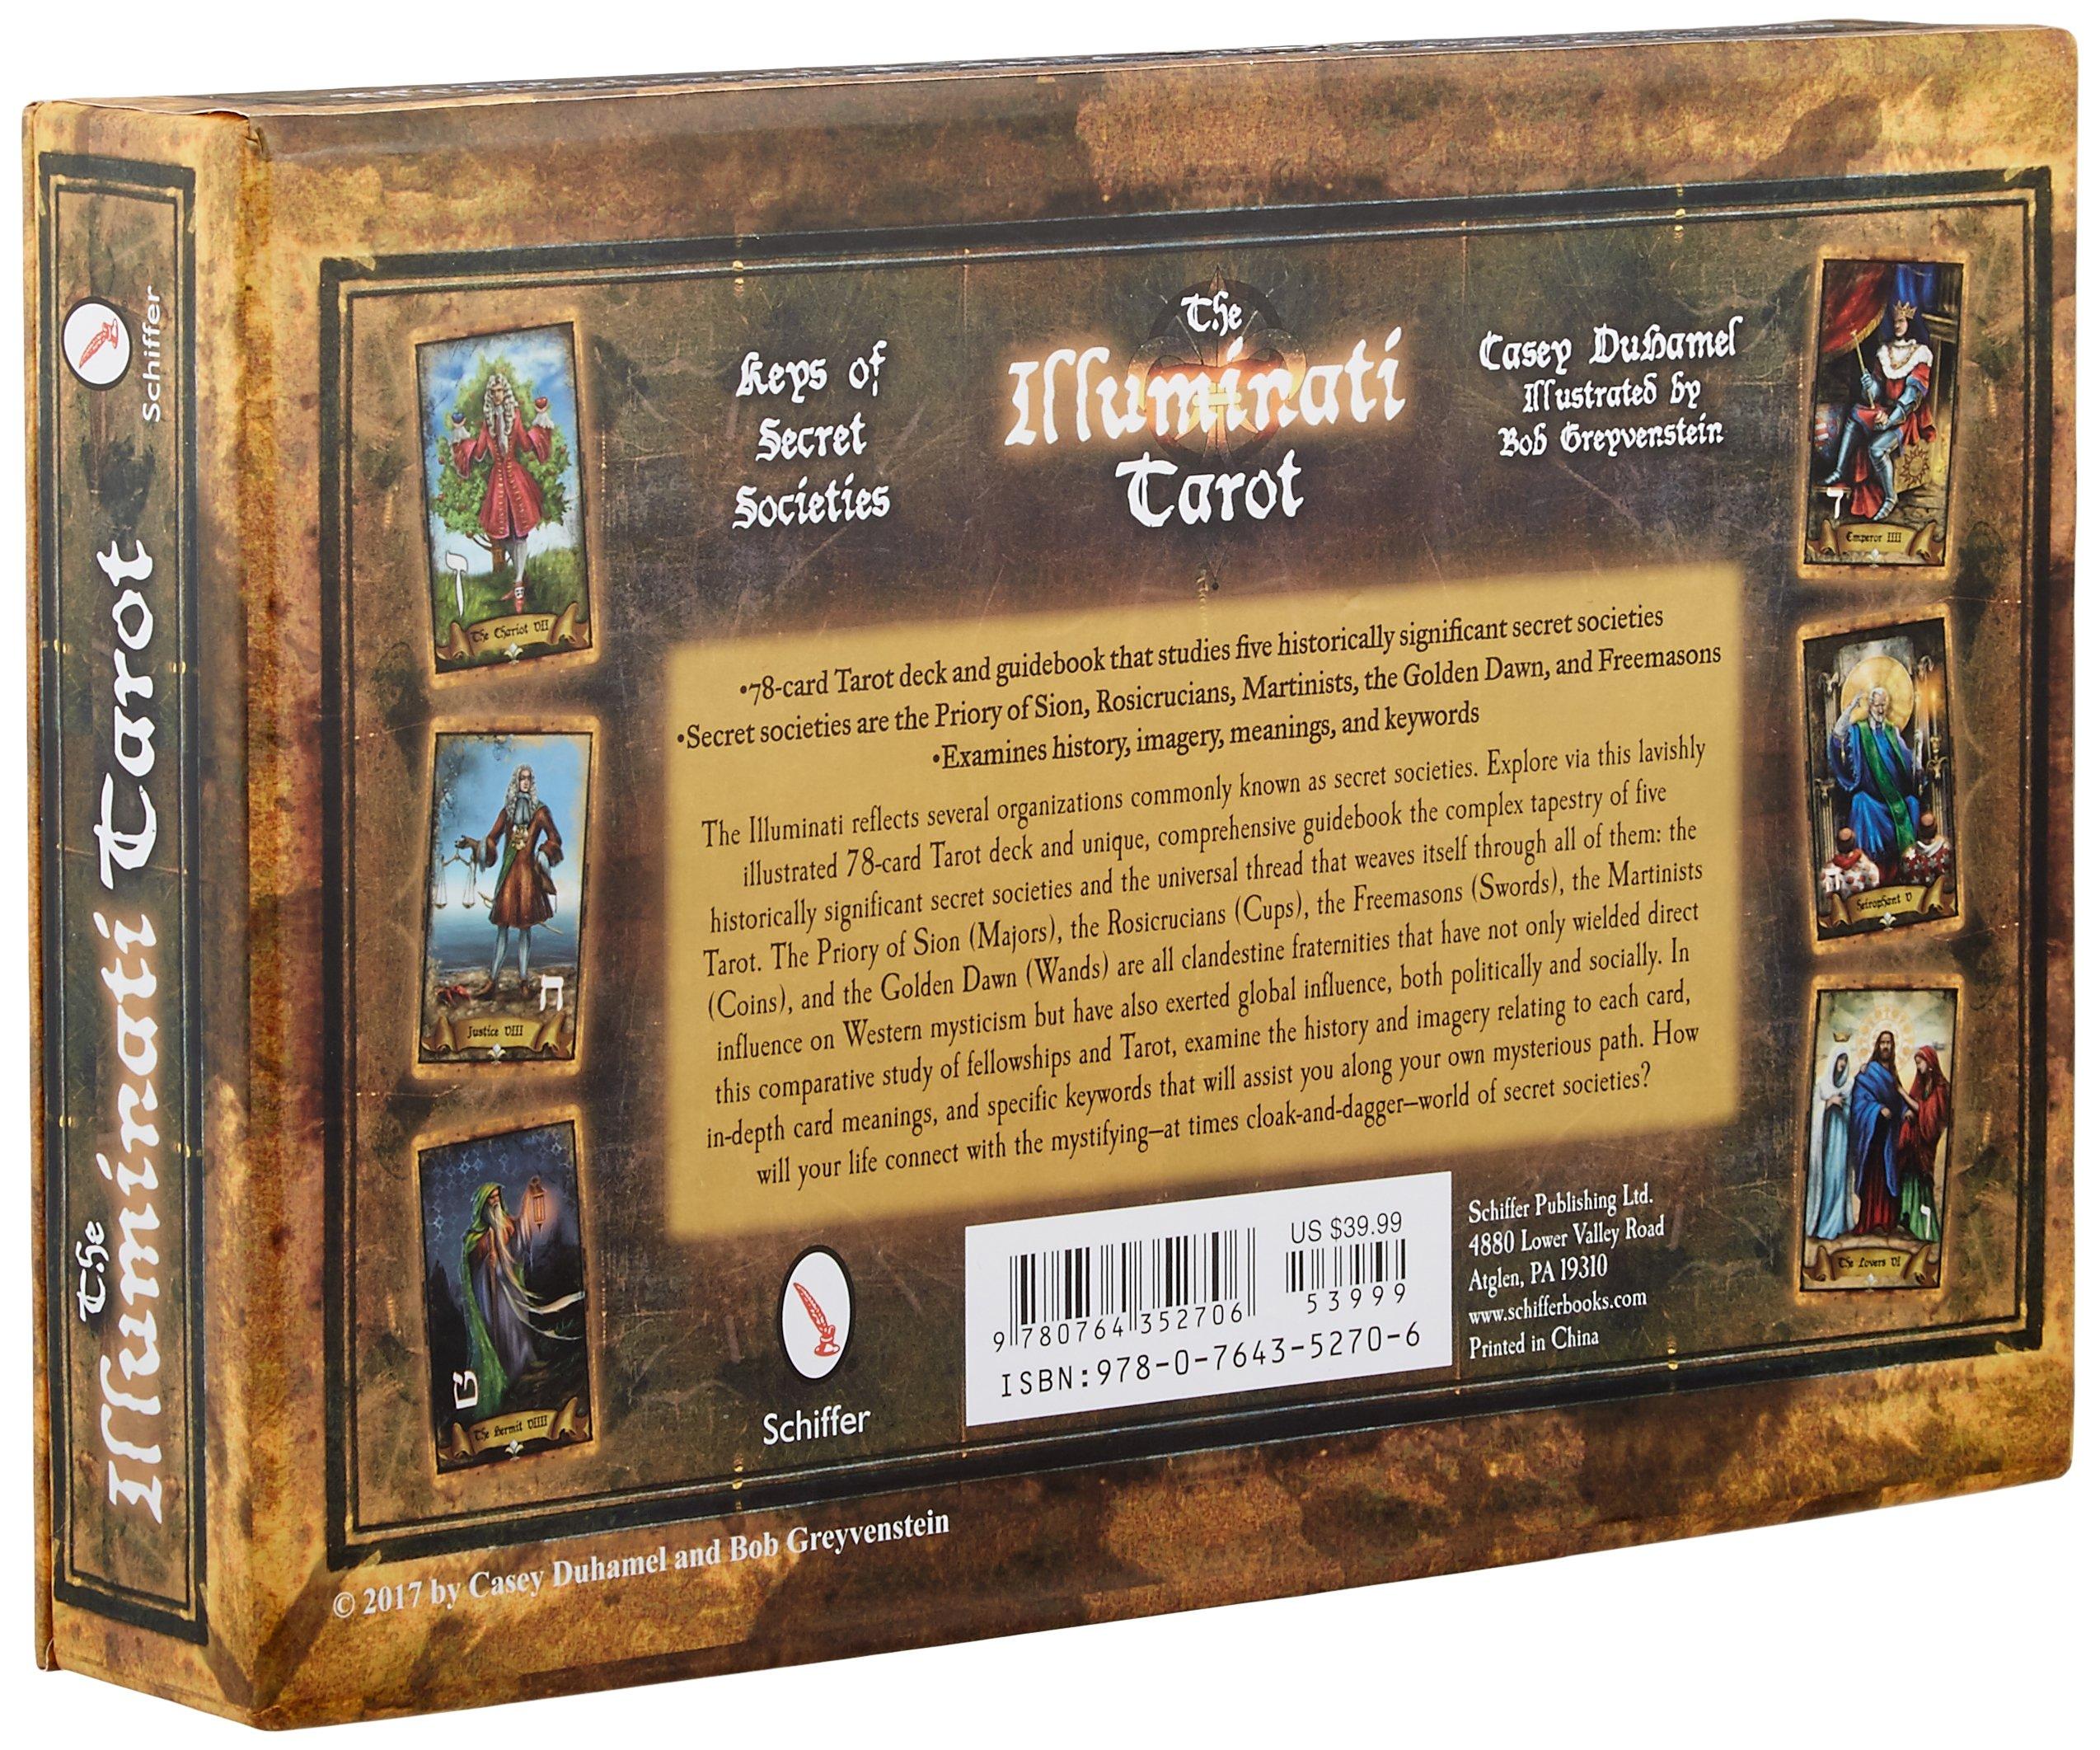 The Illuminati Tarot: Keys of Secret Societies: Amazon.es: DuHamel, Casey, Greyvenstein, Bob: Libros en idiomas extranjeros